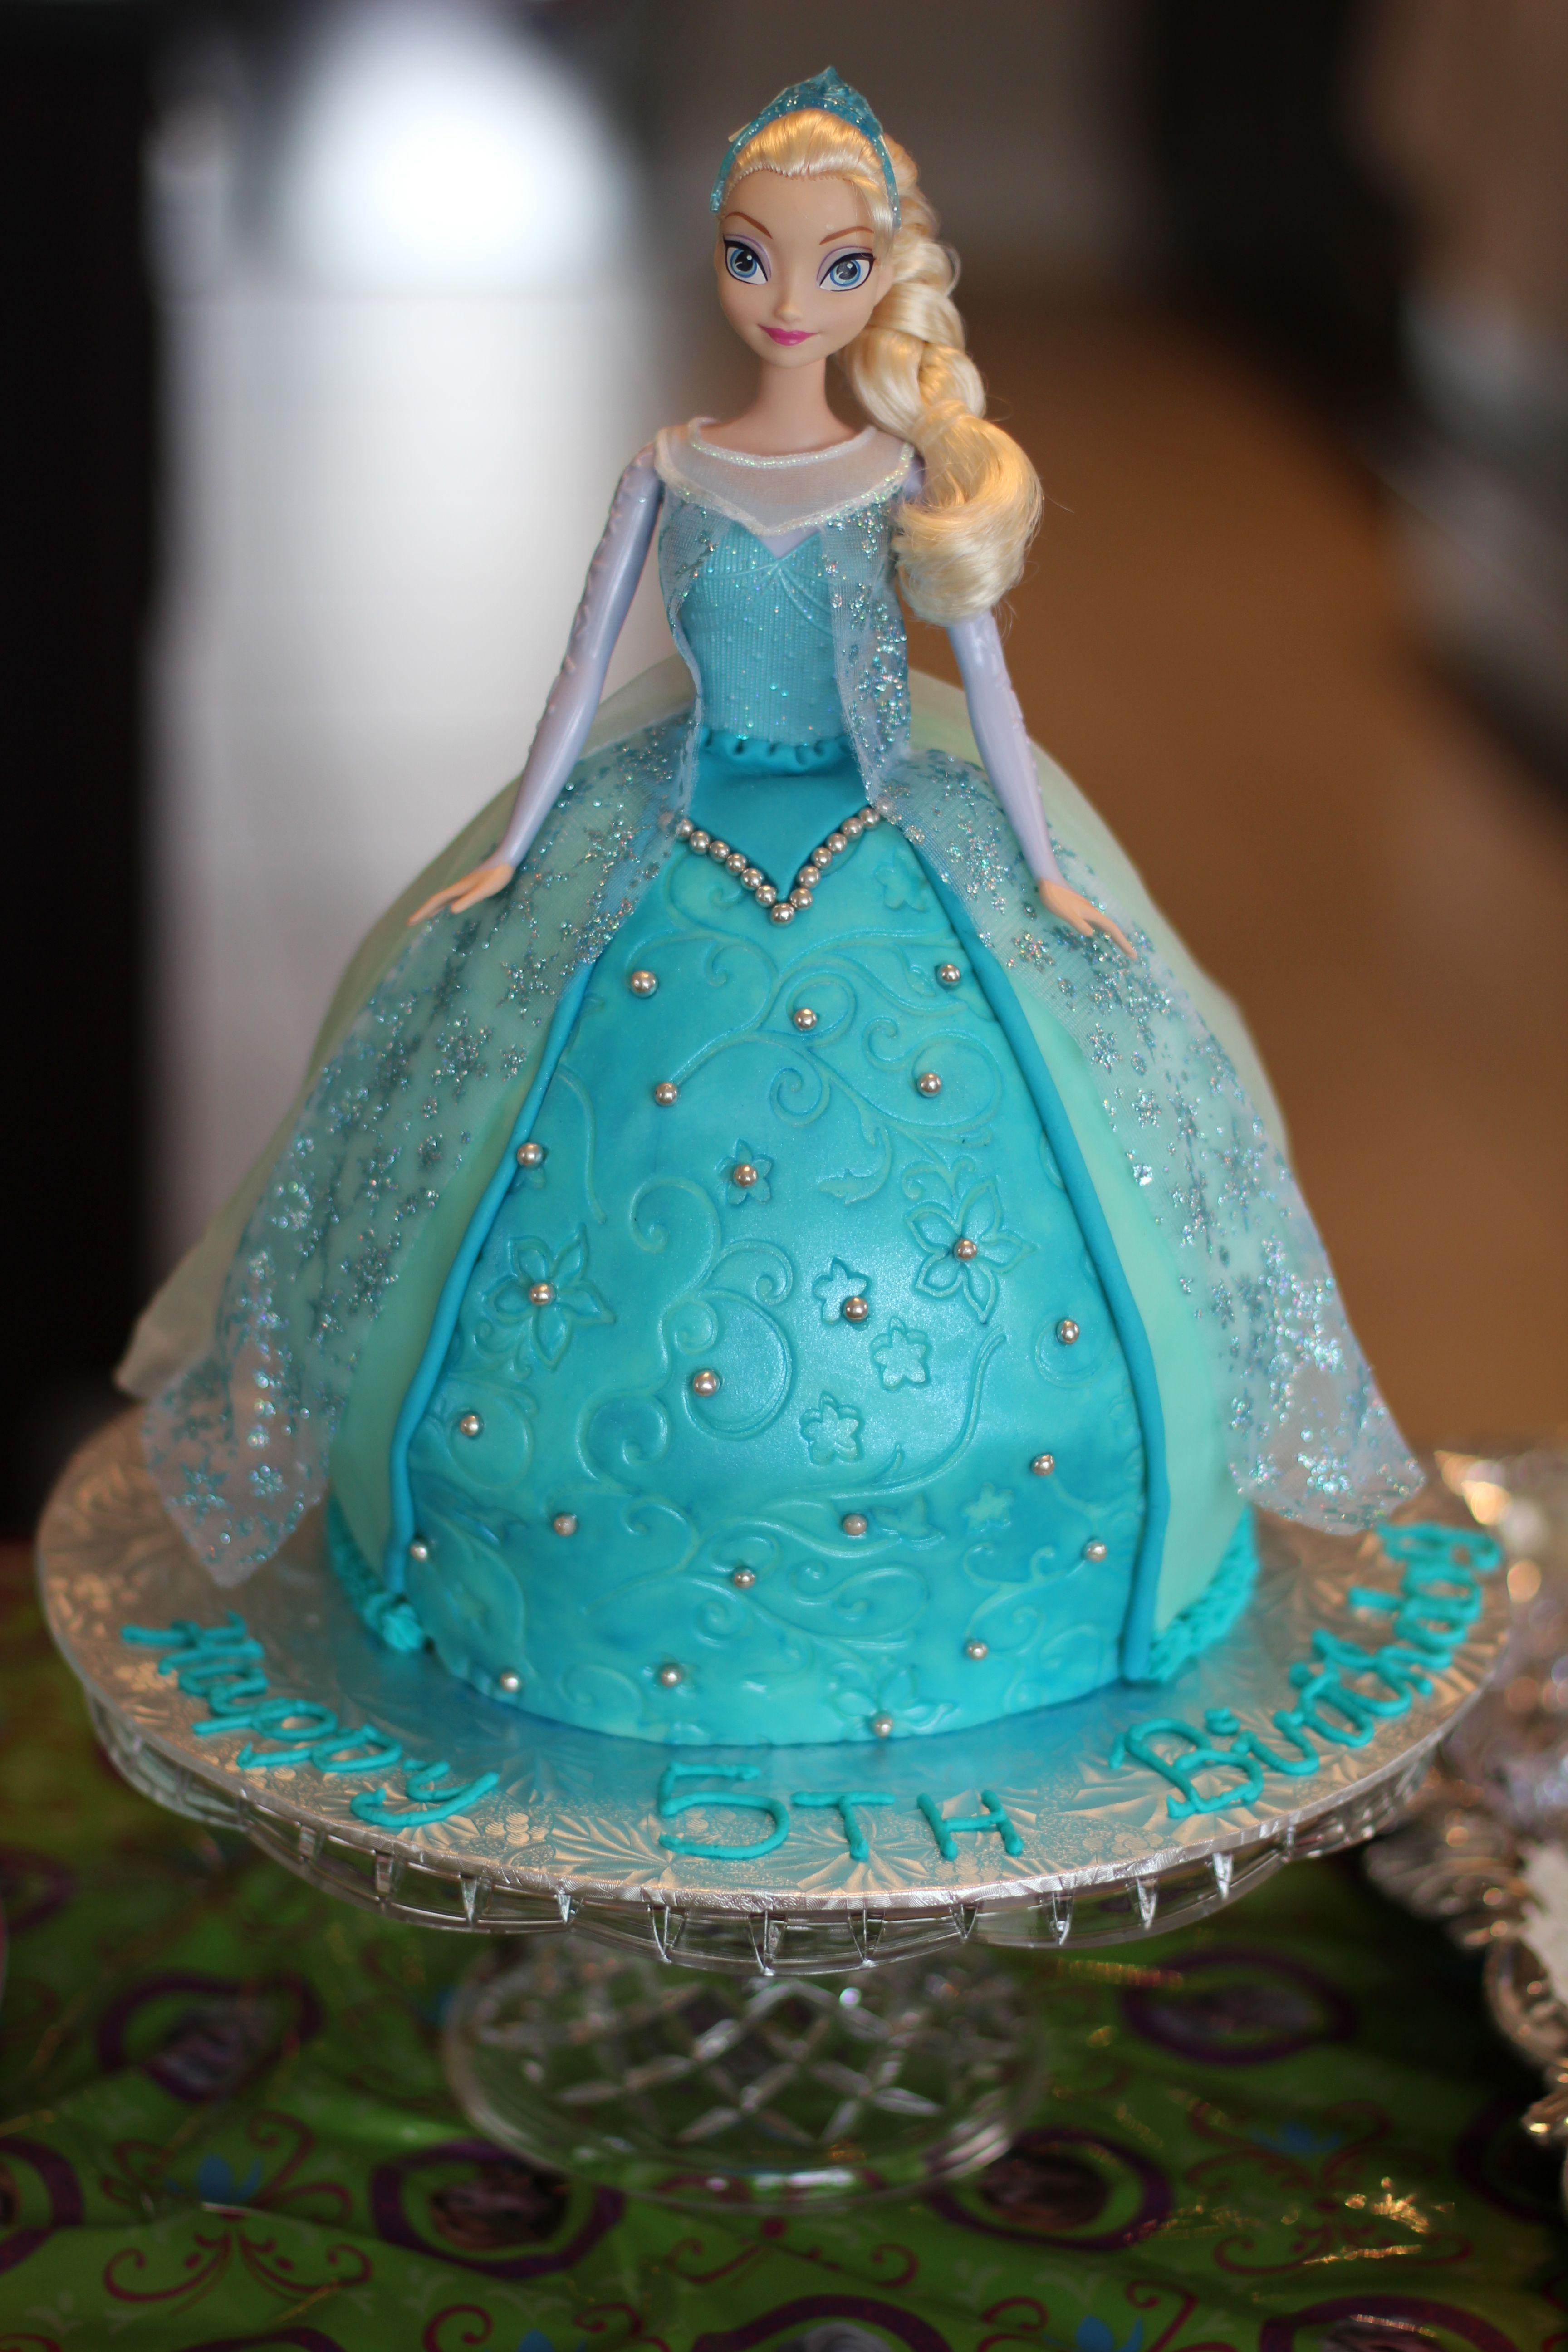 Frozen Elsa Cake With Fondant I Used The Wilton Classic